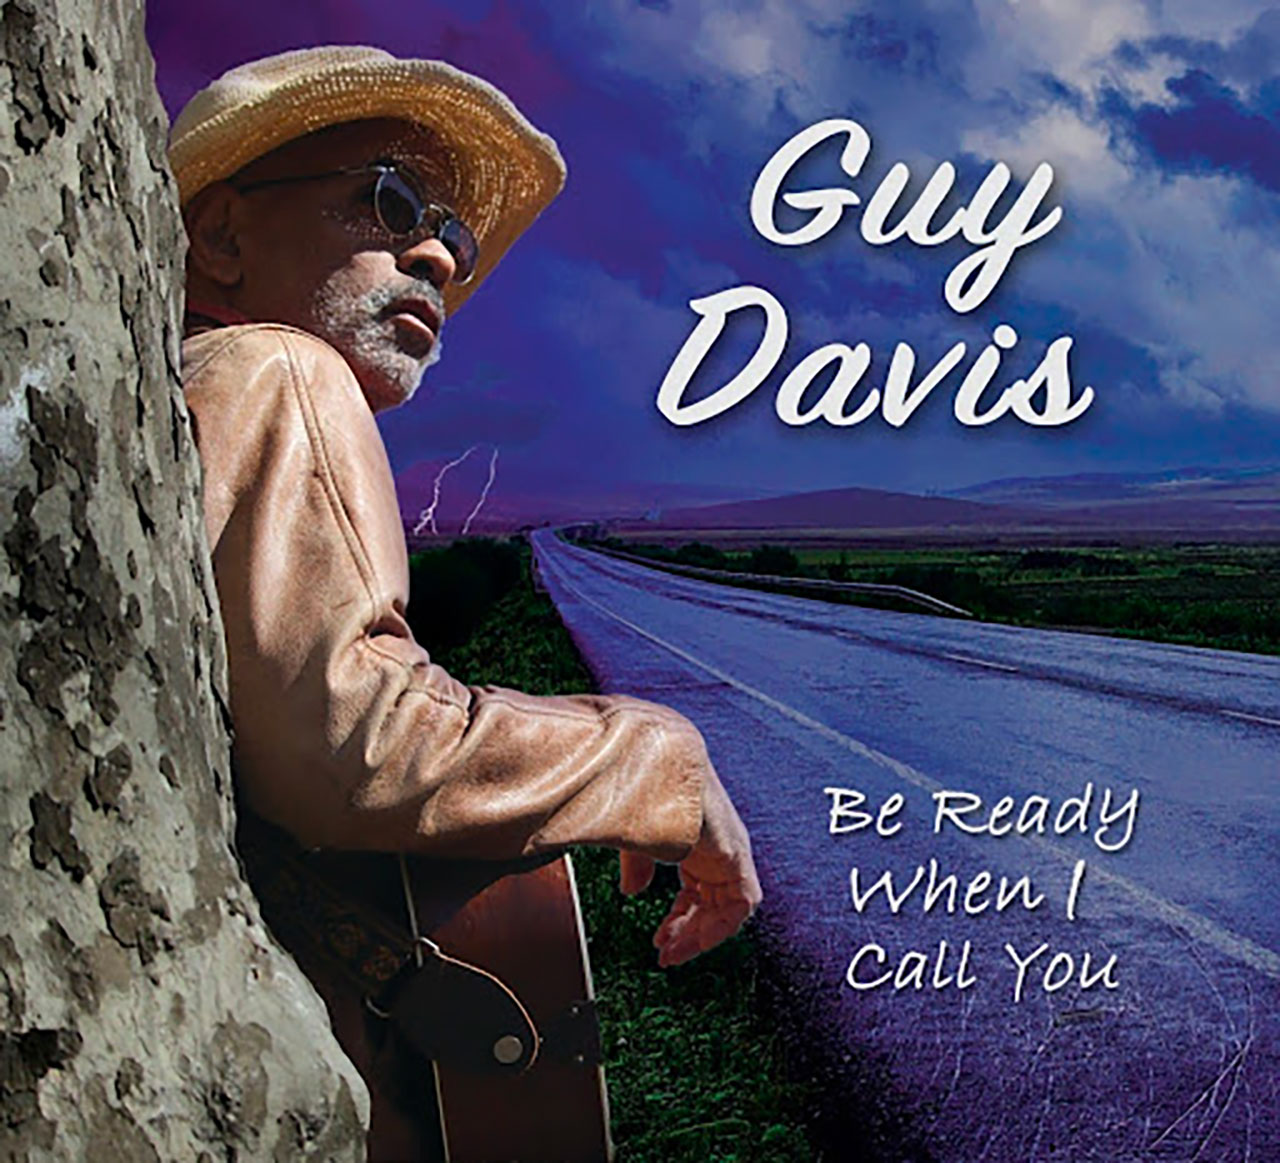 Guy Davis Be Ready When I Call You cover album